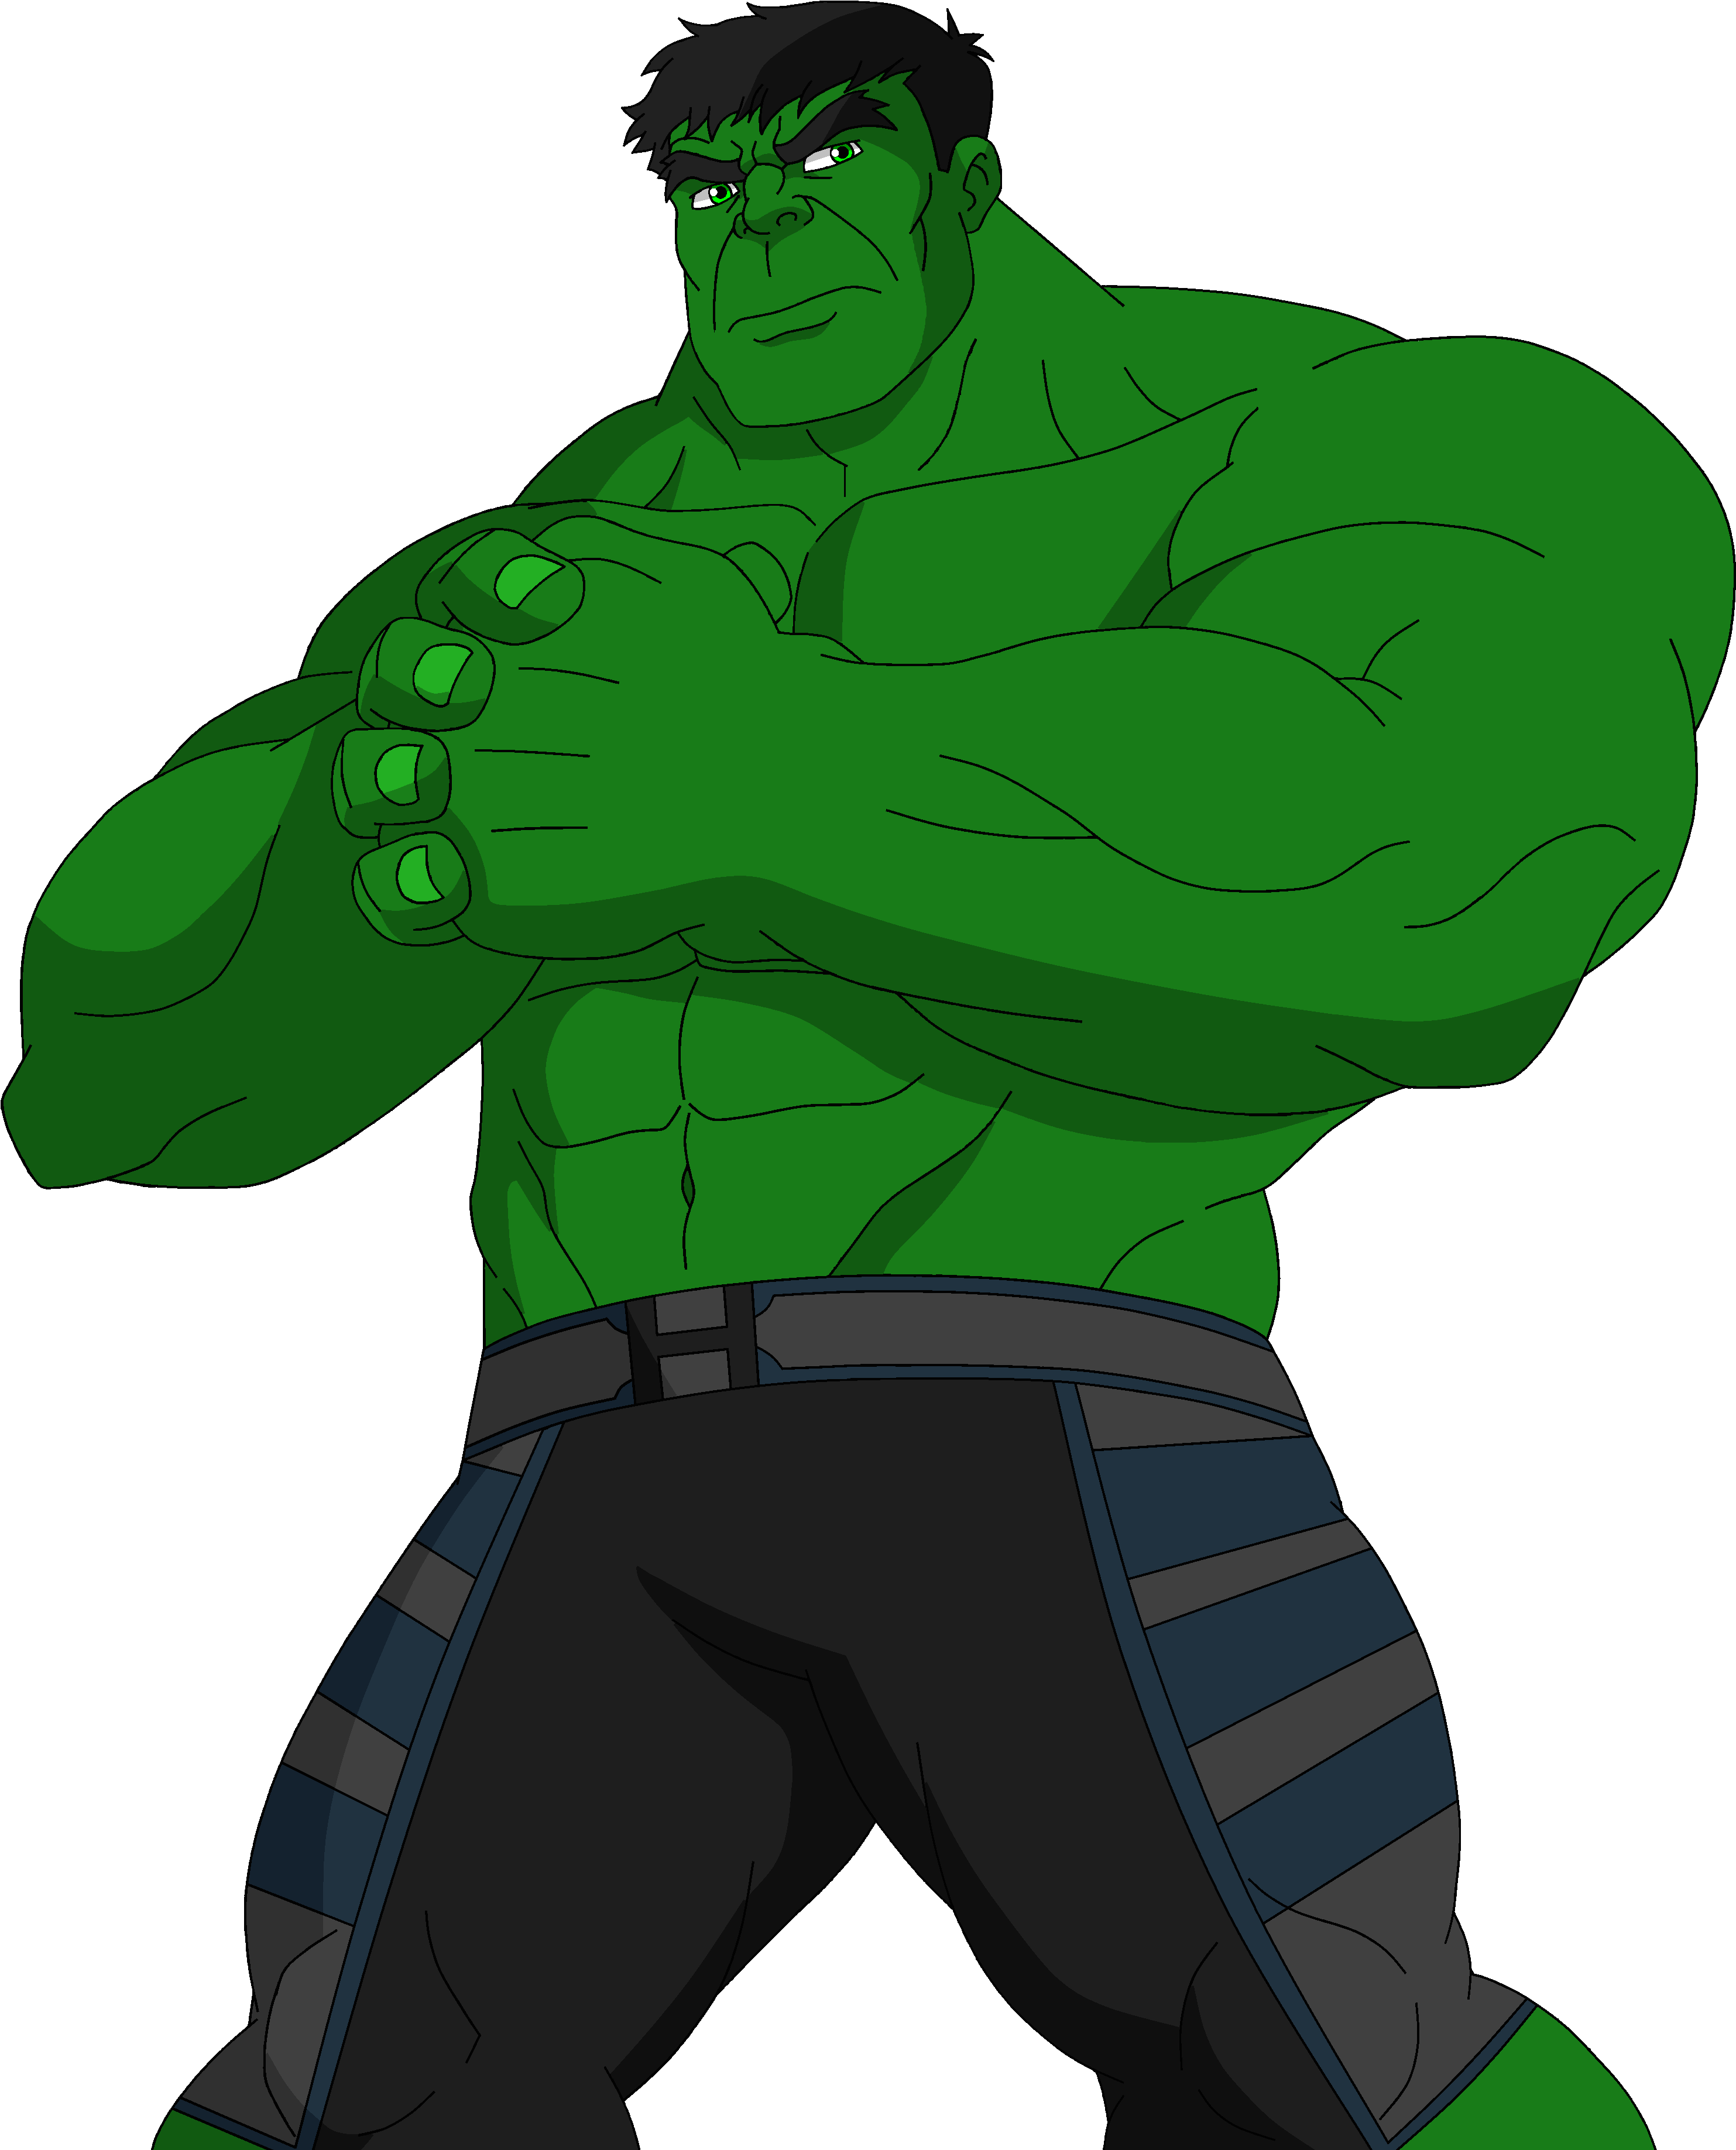 Download Imagenes Animadas De Hulk Full Size Png Image Pngkit